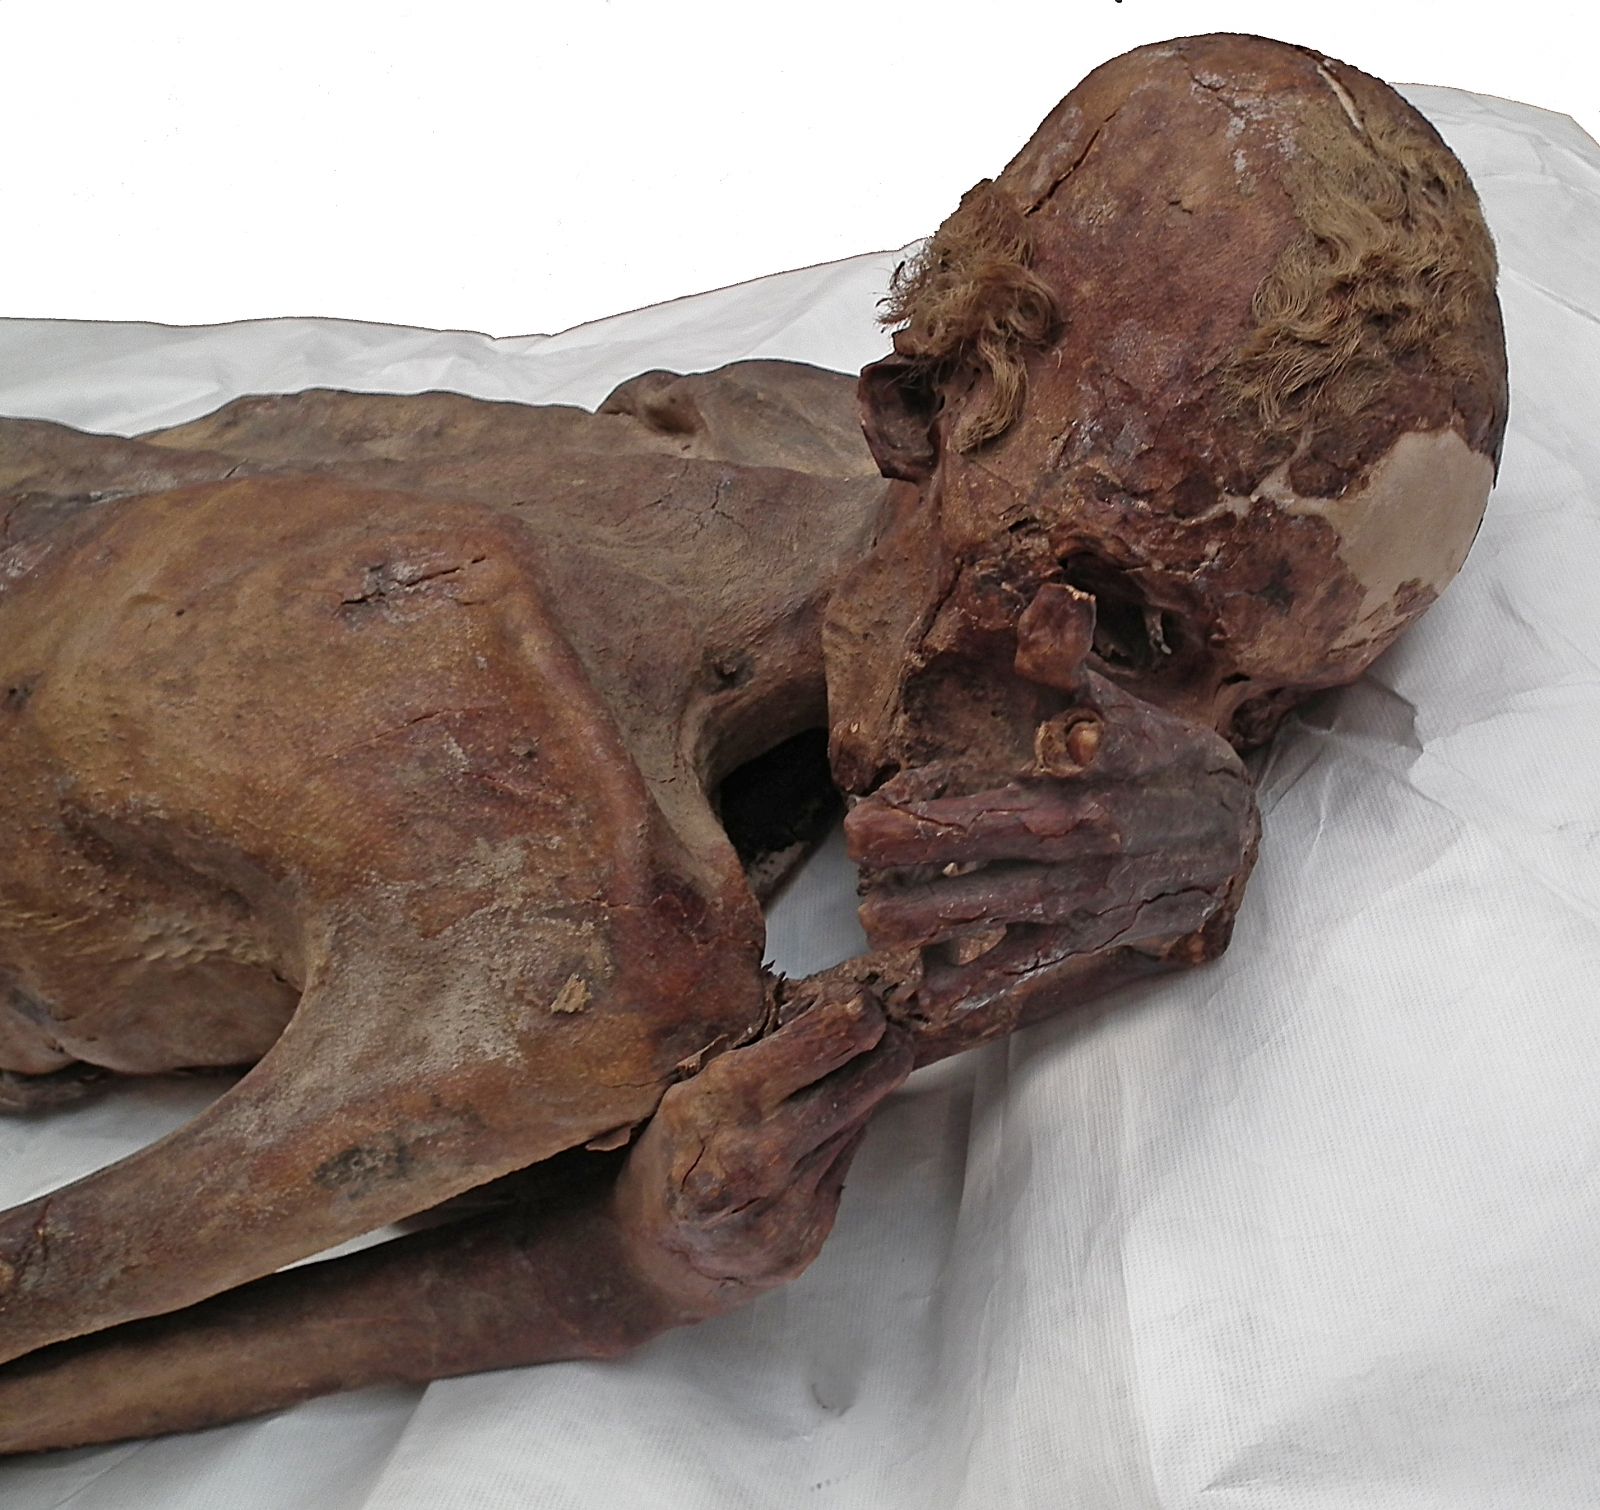 Gebelein male mummy